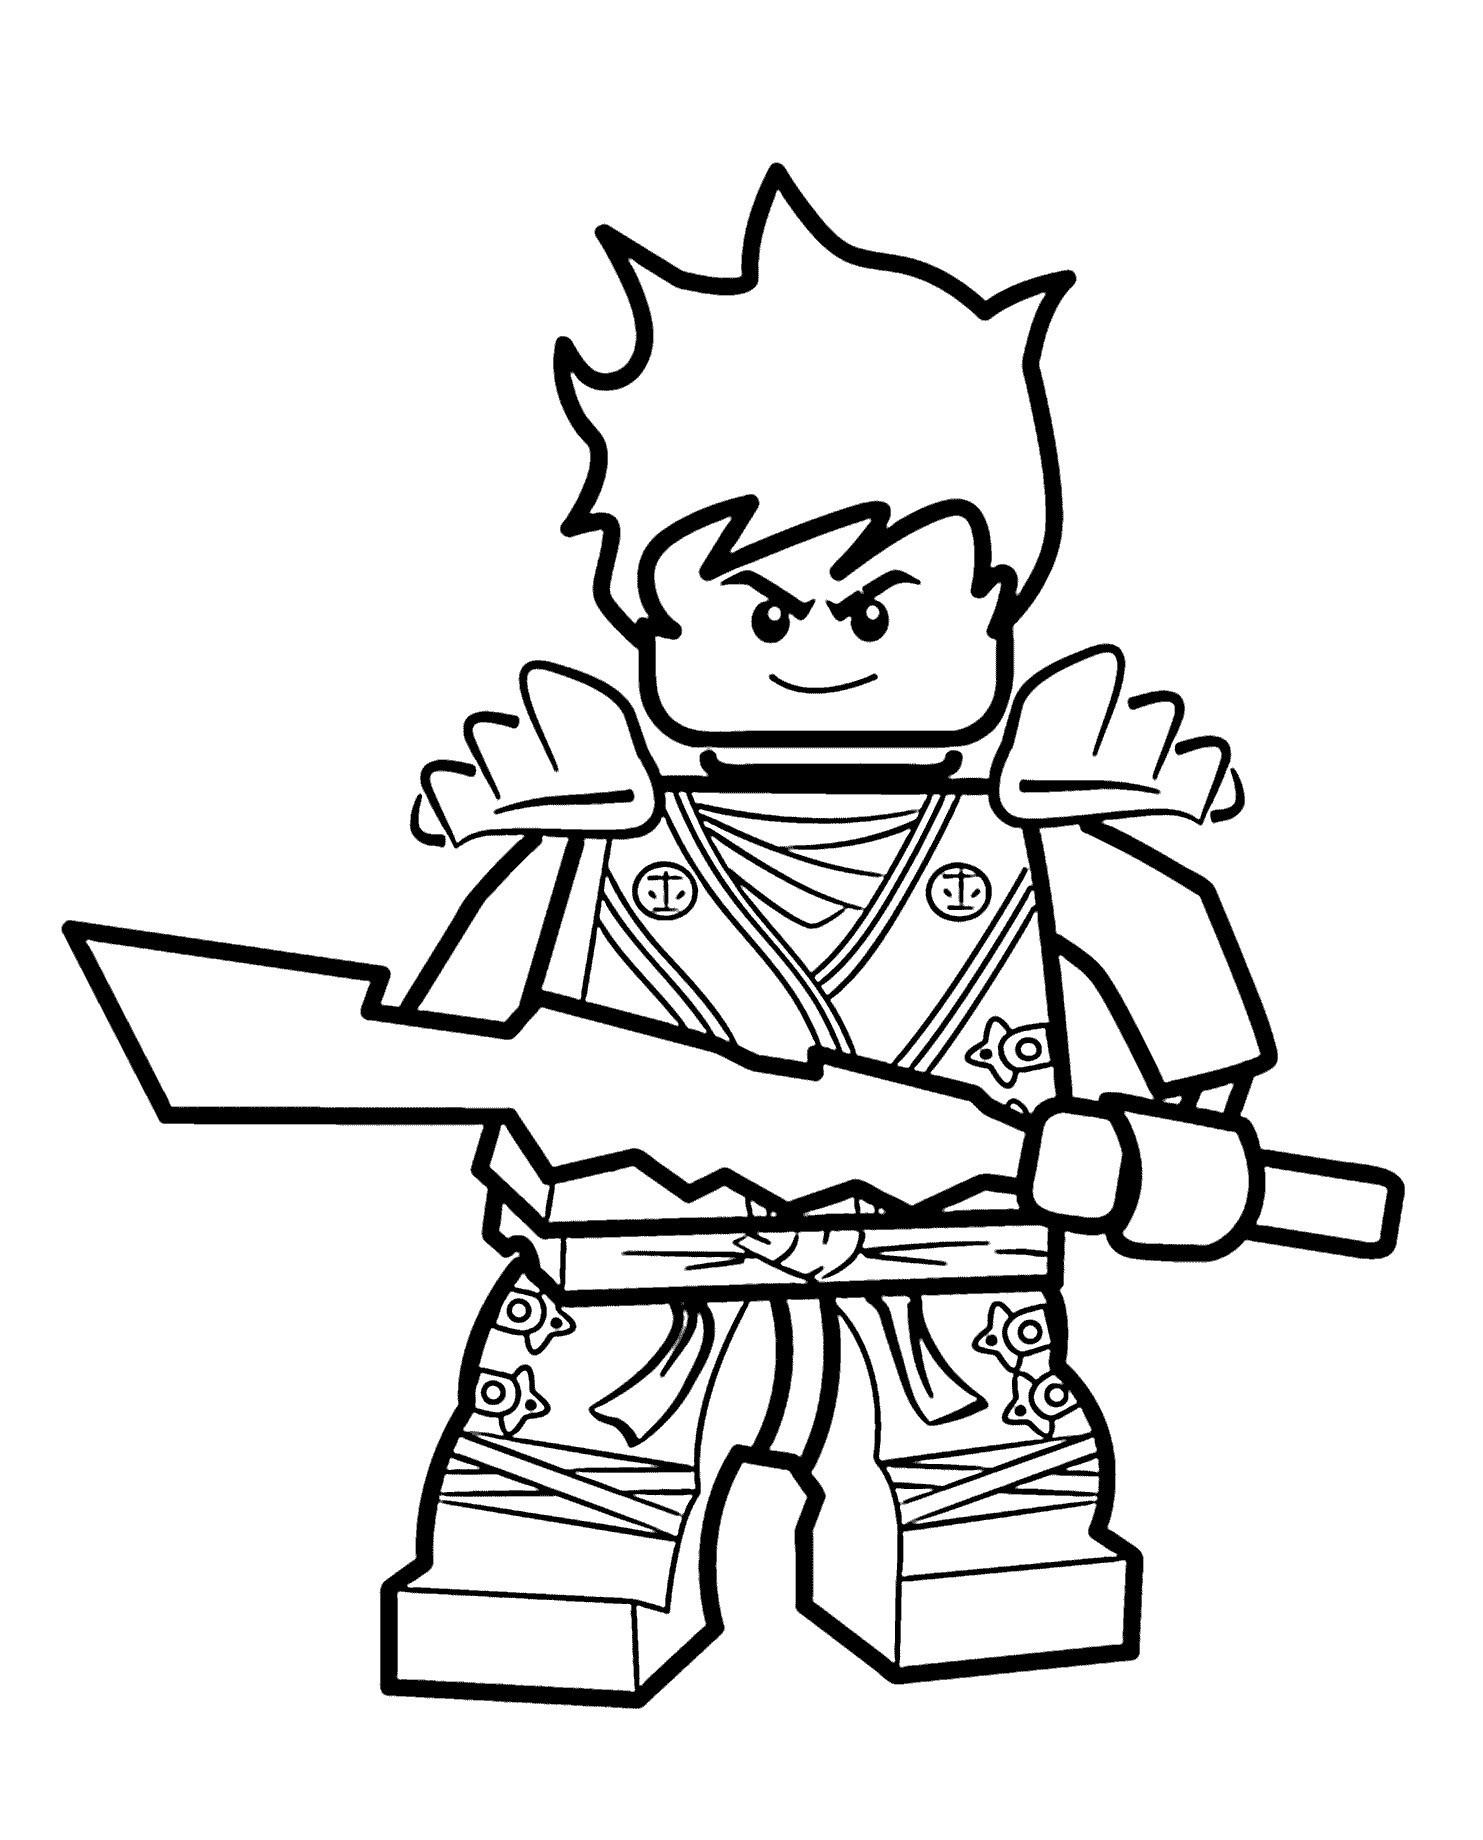 Lego Ninjago Zum Ausmalen Genial Lego Ninjago Coloring Pages Free Lego Ninjago Coloring Sheet Sheets Fotografieren